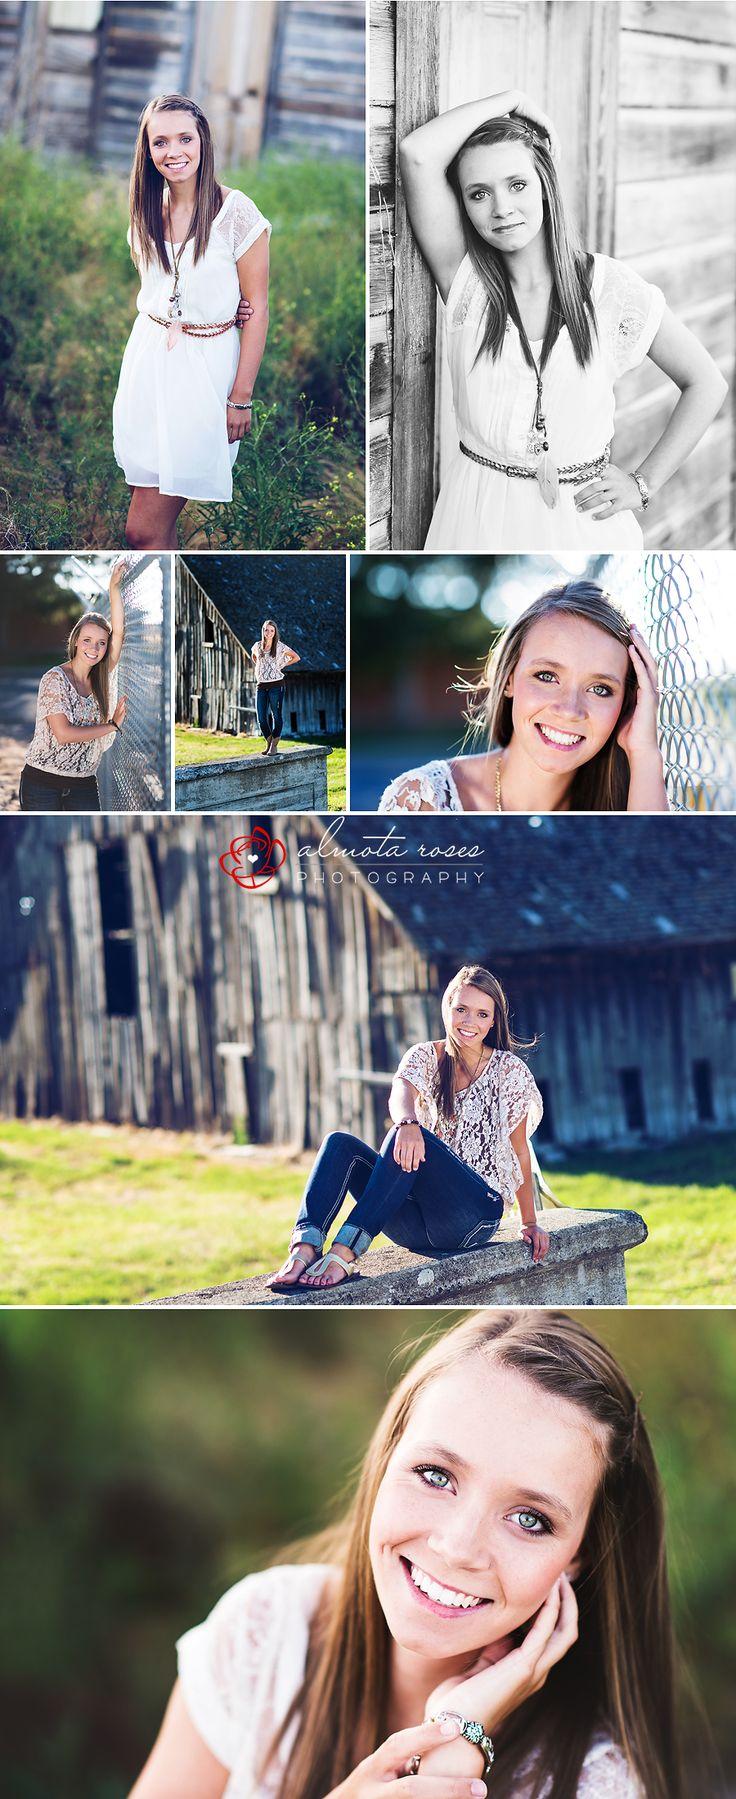 cheerleading senior picture ideas - Google Search